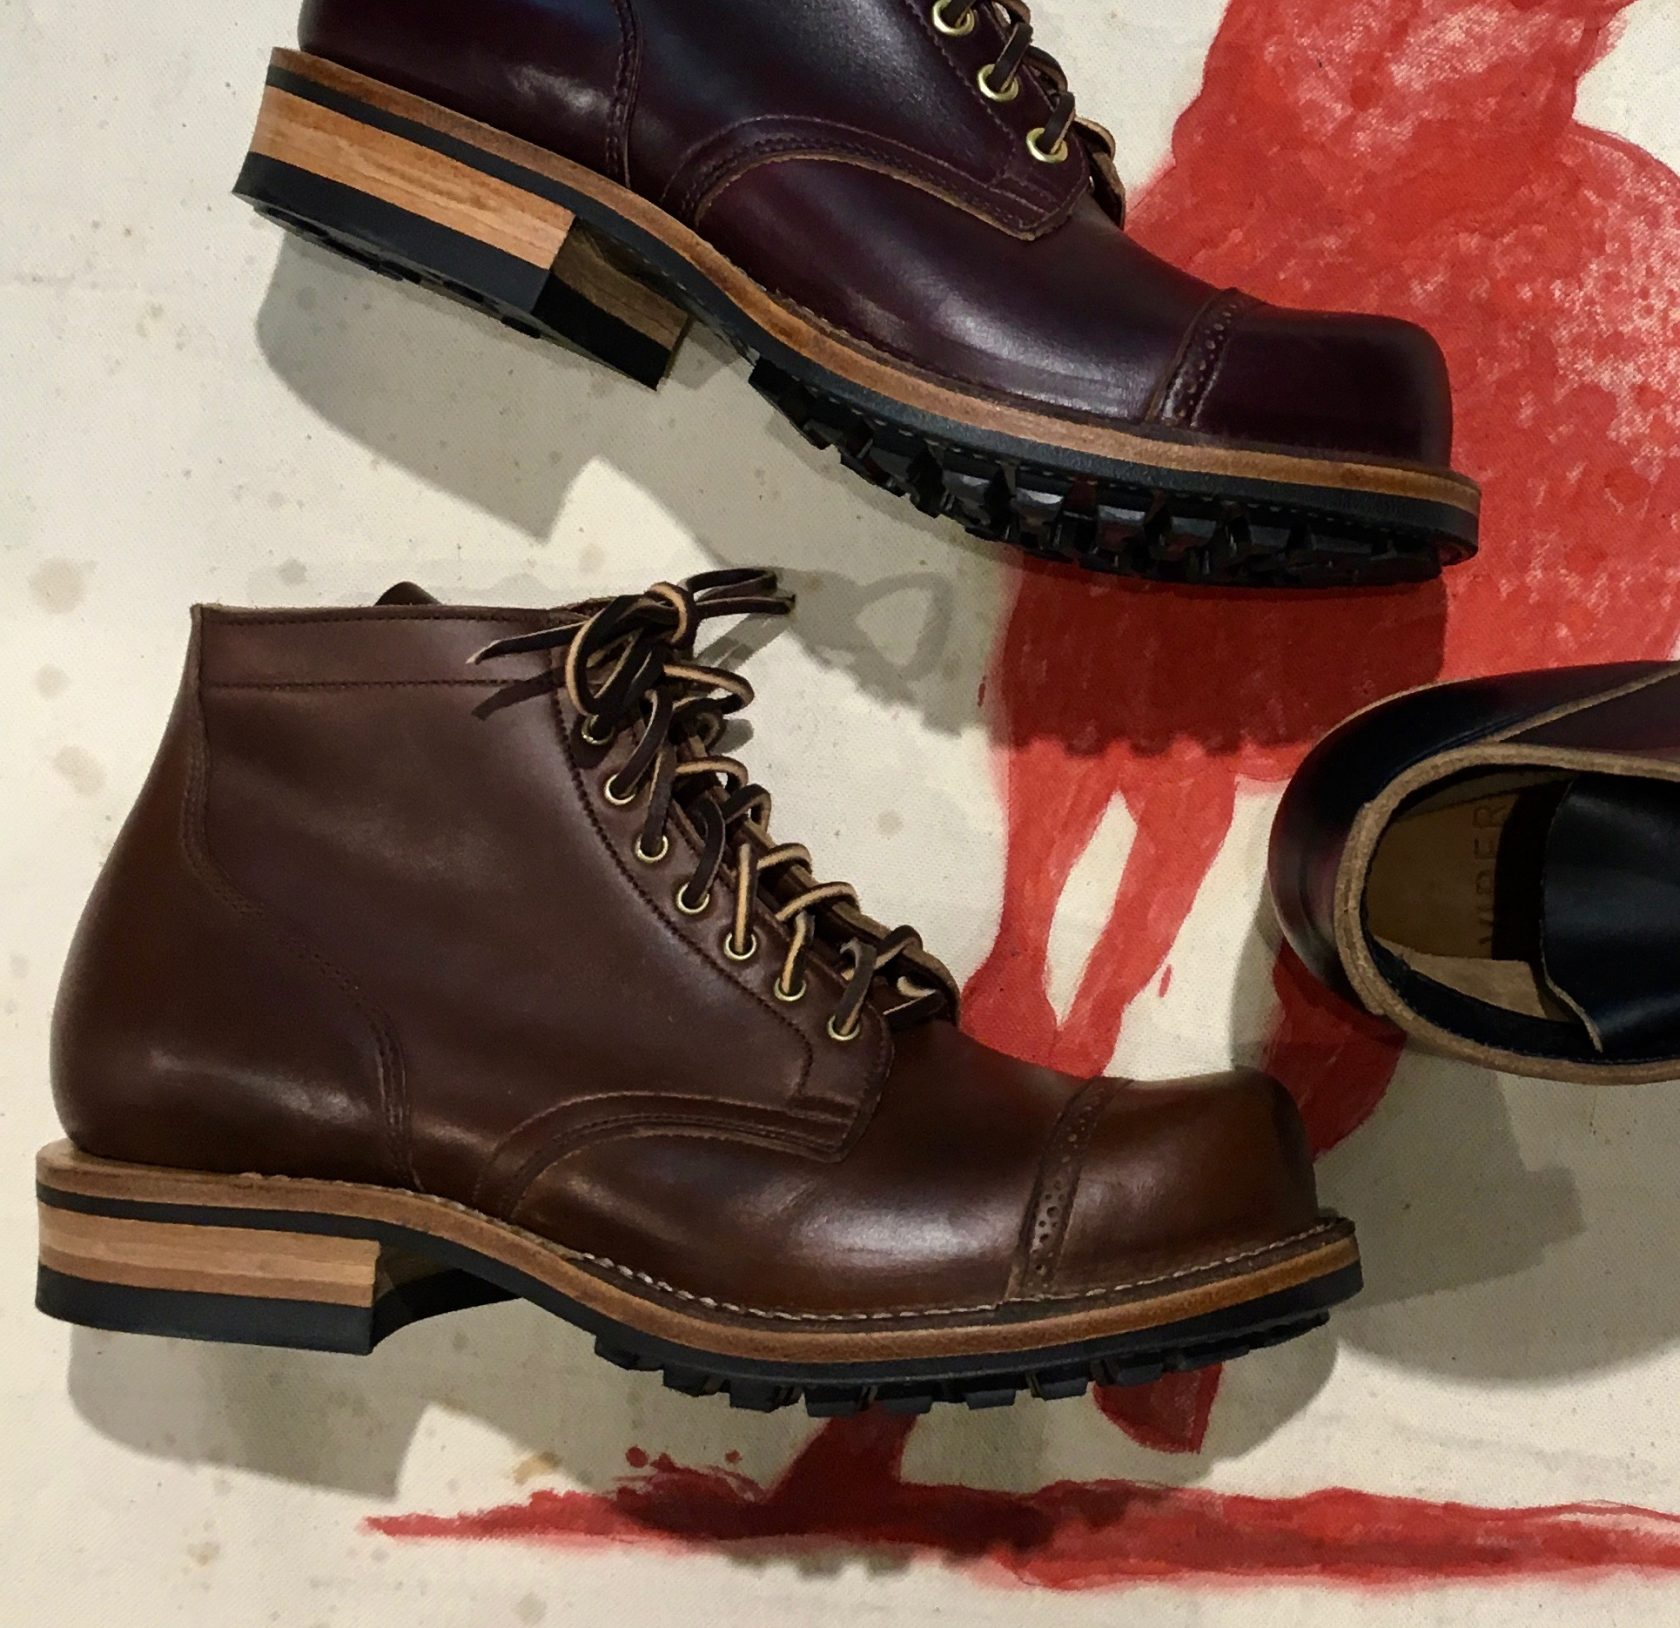 Viberg Service Boot brown cxl